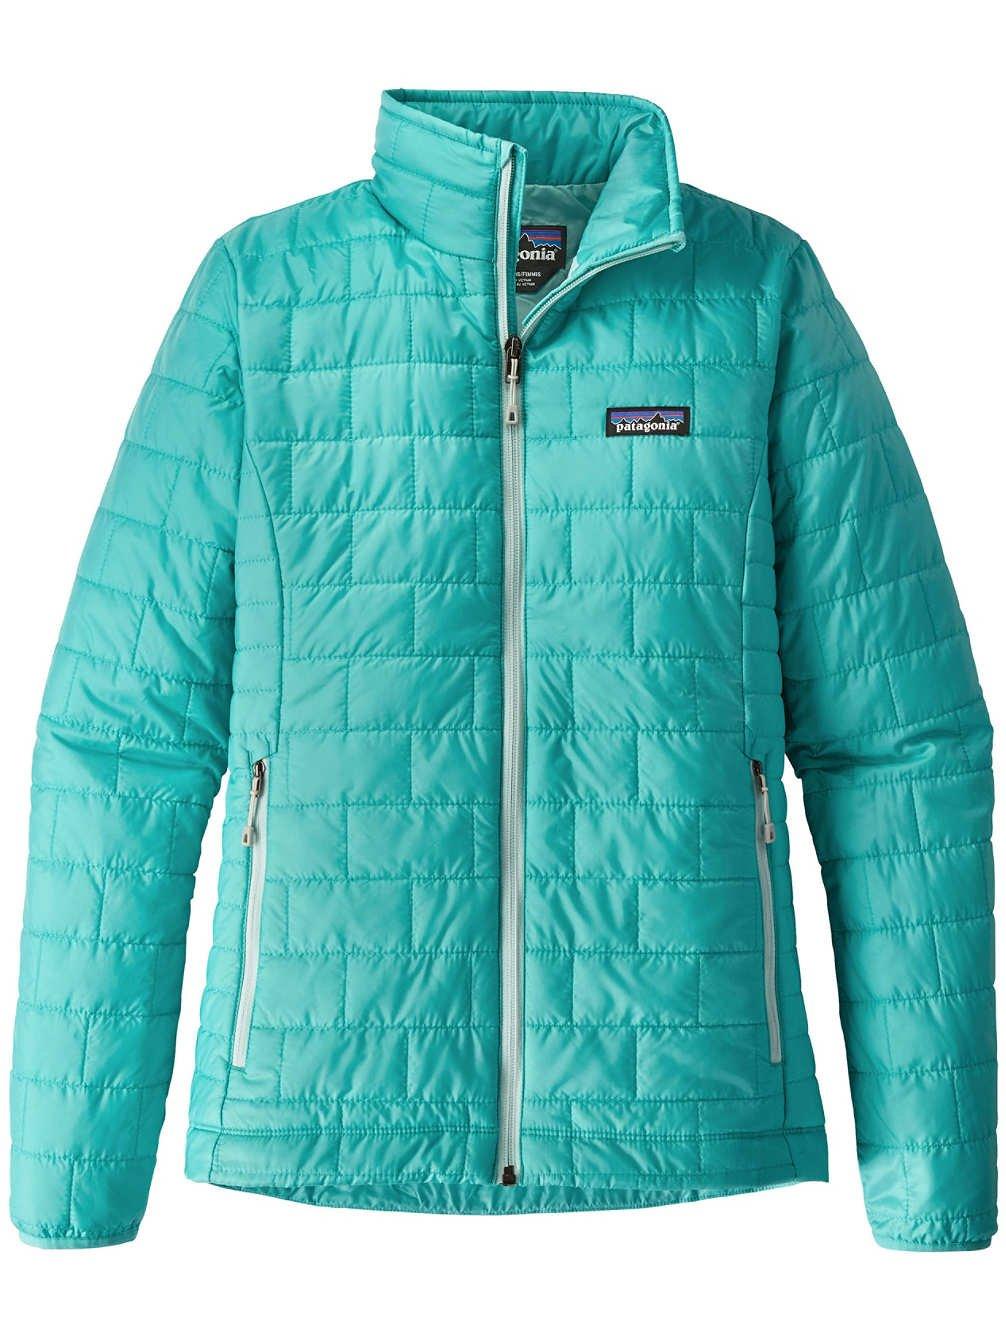 Patagonia Women's Nano Puff Insulated Jacket (Large, Strait Blue)